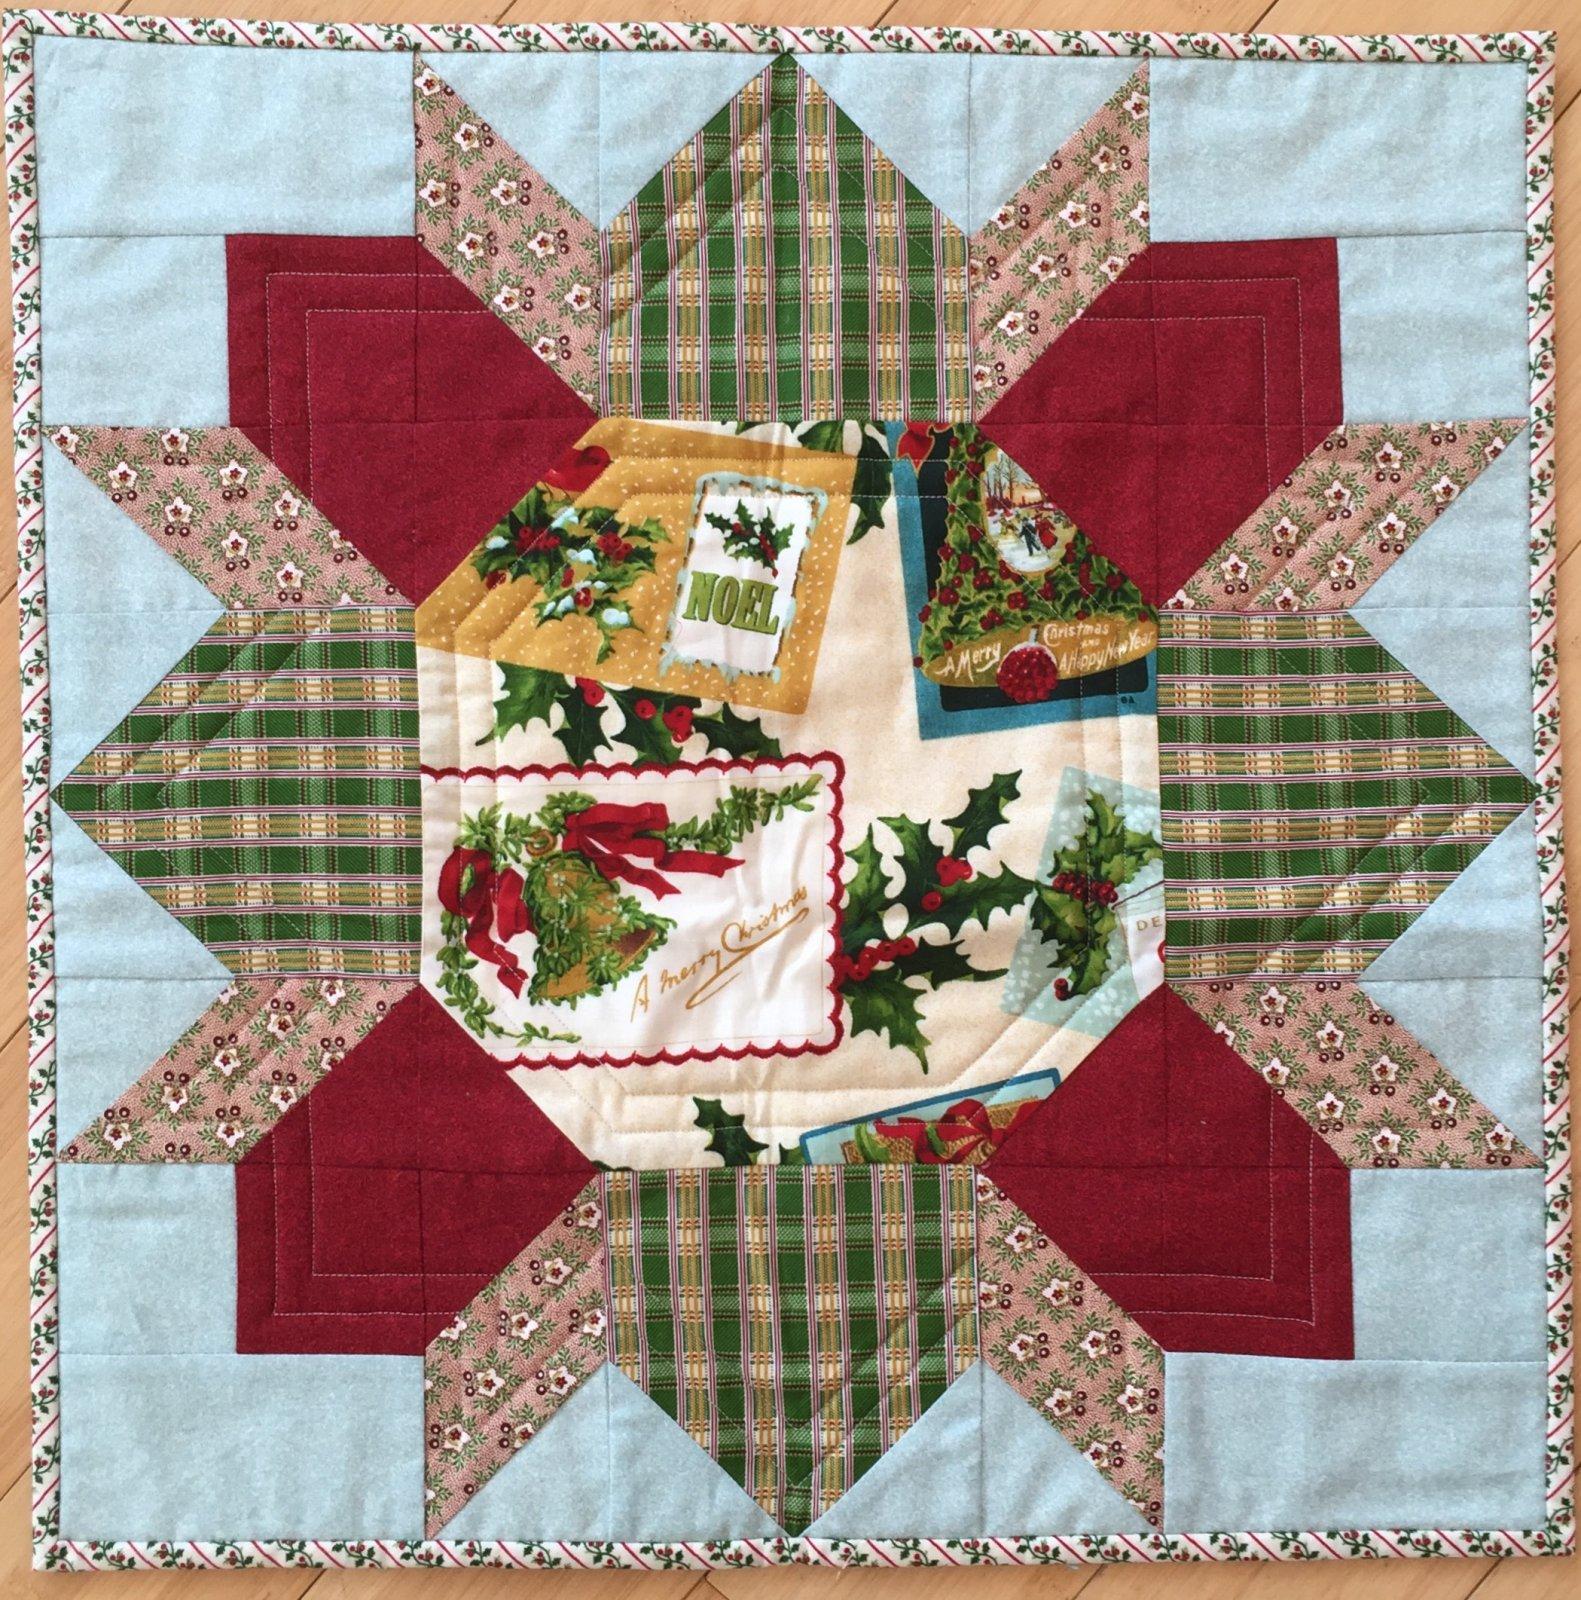 Yuletide Wreath quilt kit (67 x 67)